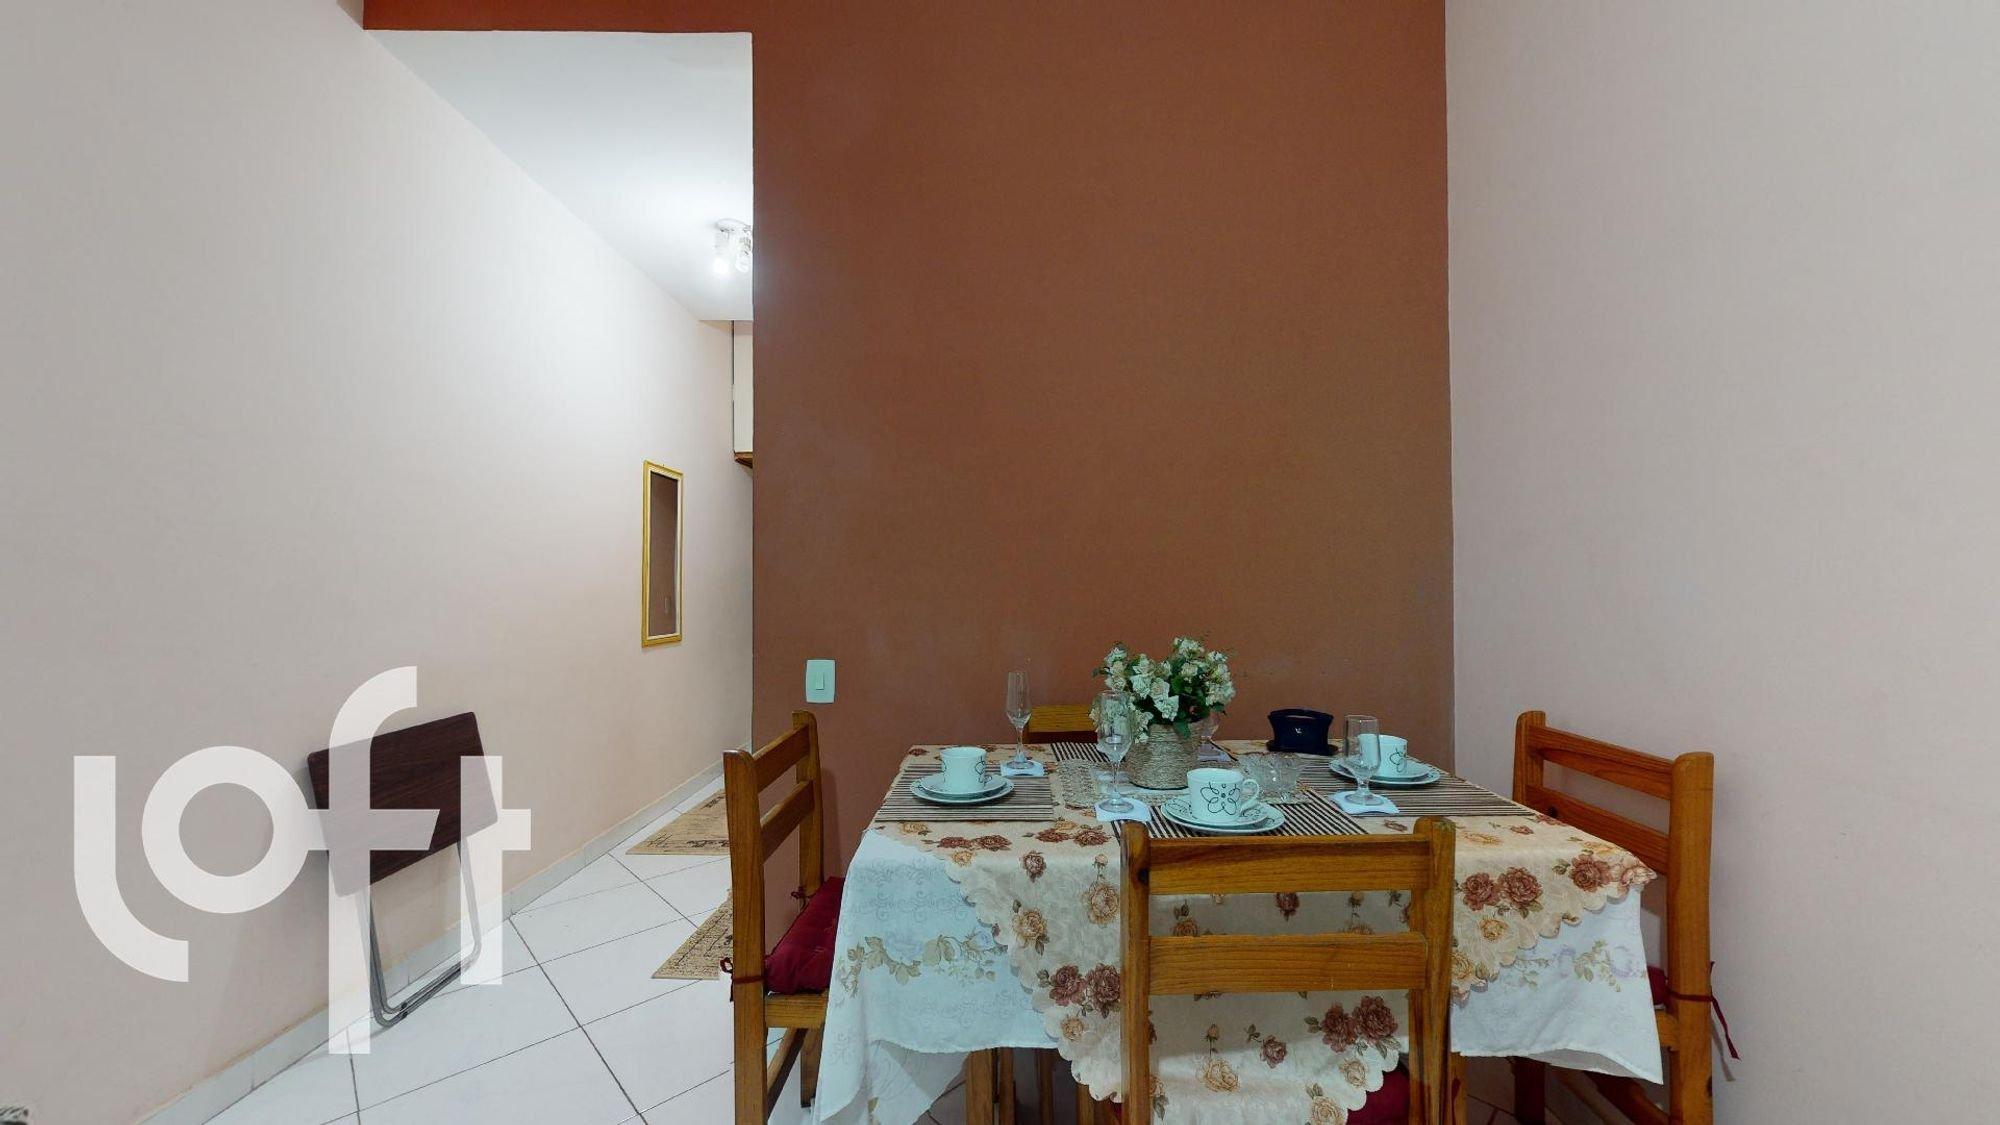 Foto de Sala com vaso de planta, copo de vinho, vaso, cadeira, mesa de jantar